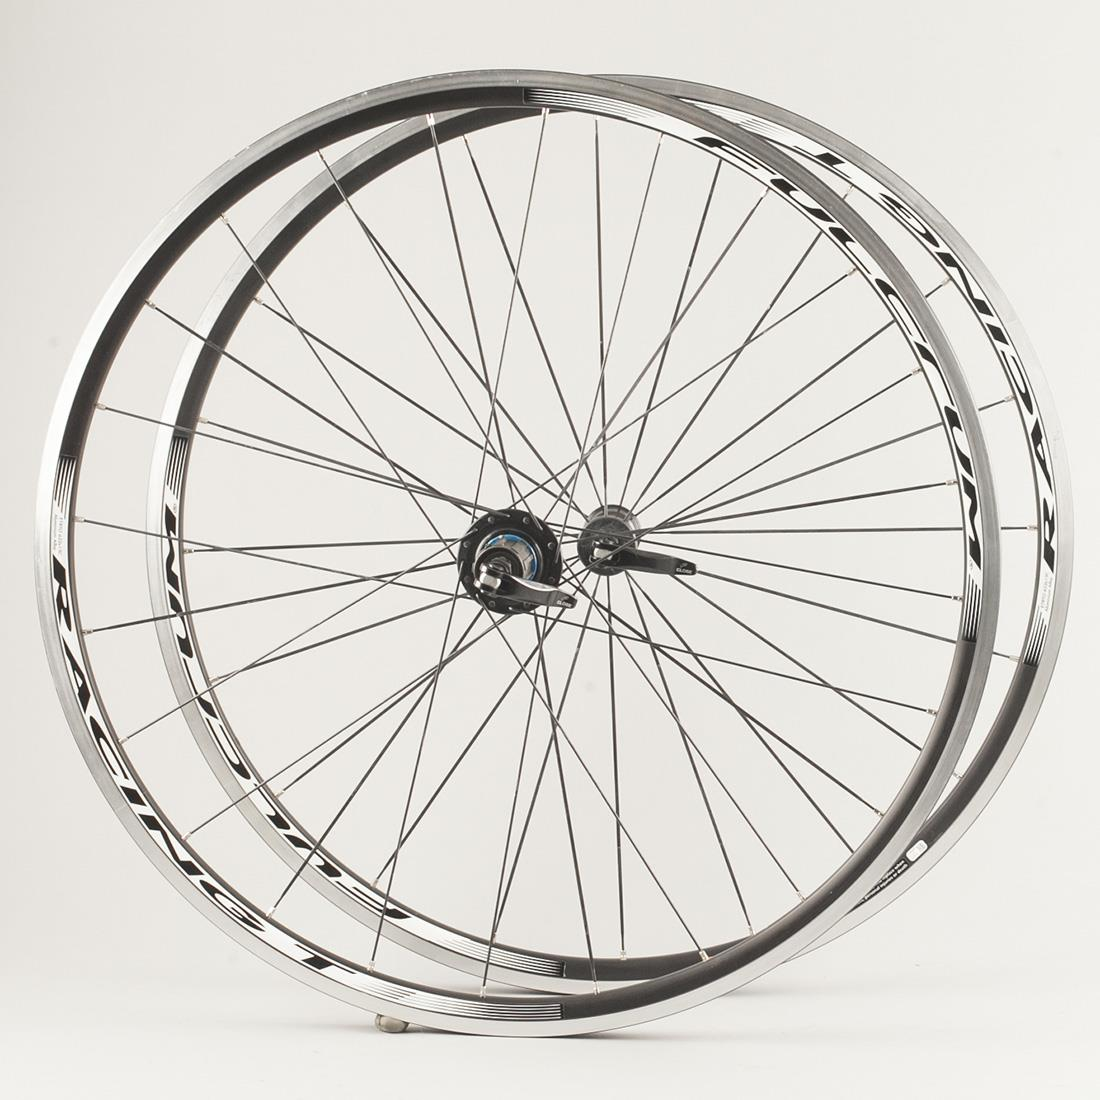 10 Speed Bike Rims : Fulcrum racing t wheelset c clincher road bike wheels